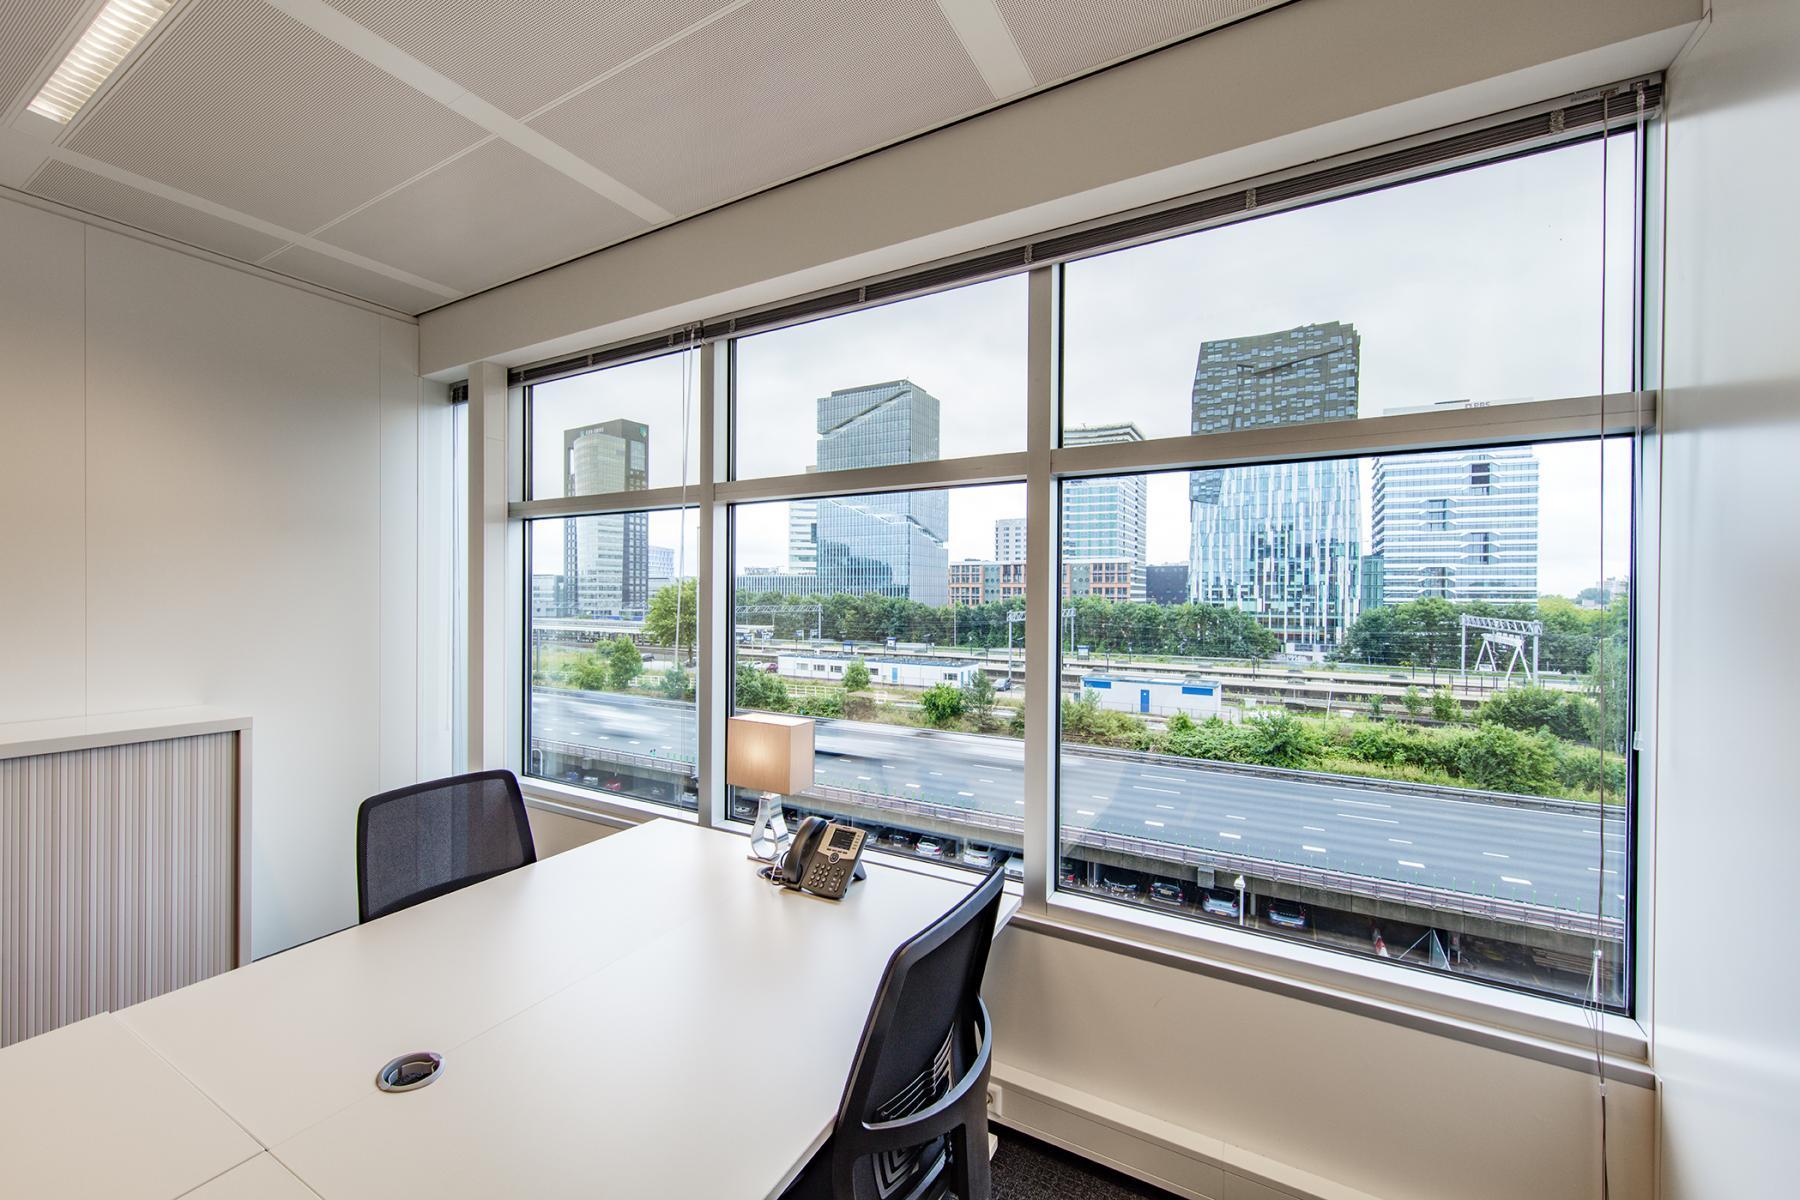 kantoorruimte kantoorkamer raam meubilair uitzicht Amsterdam